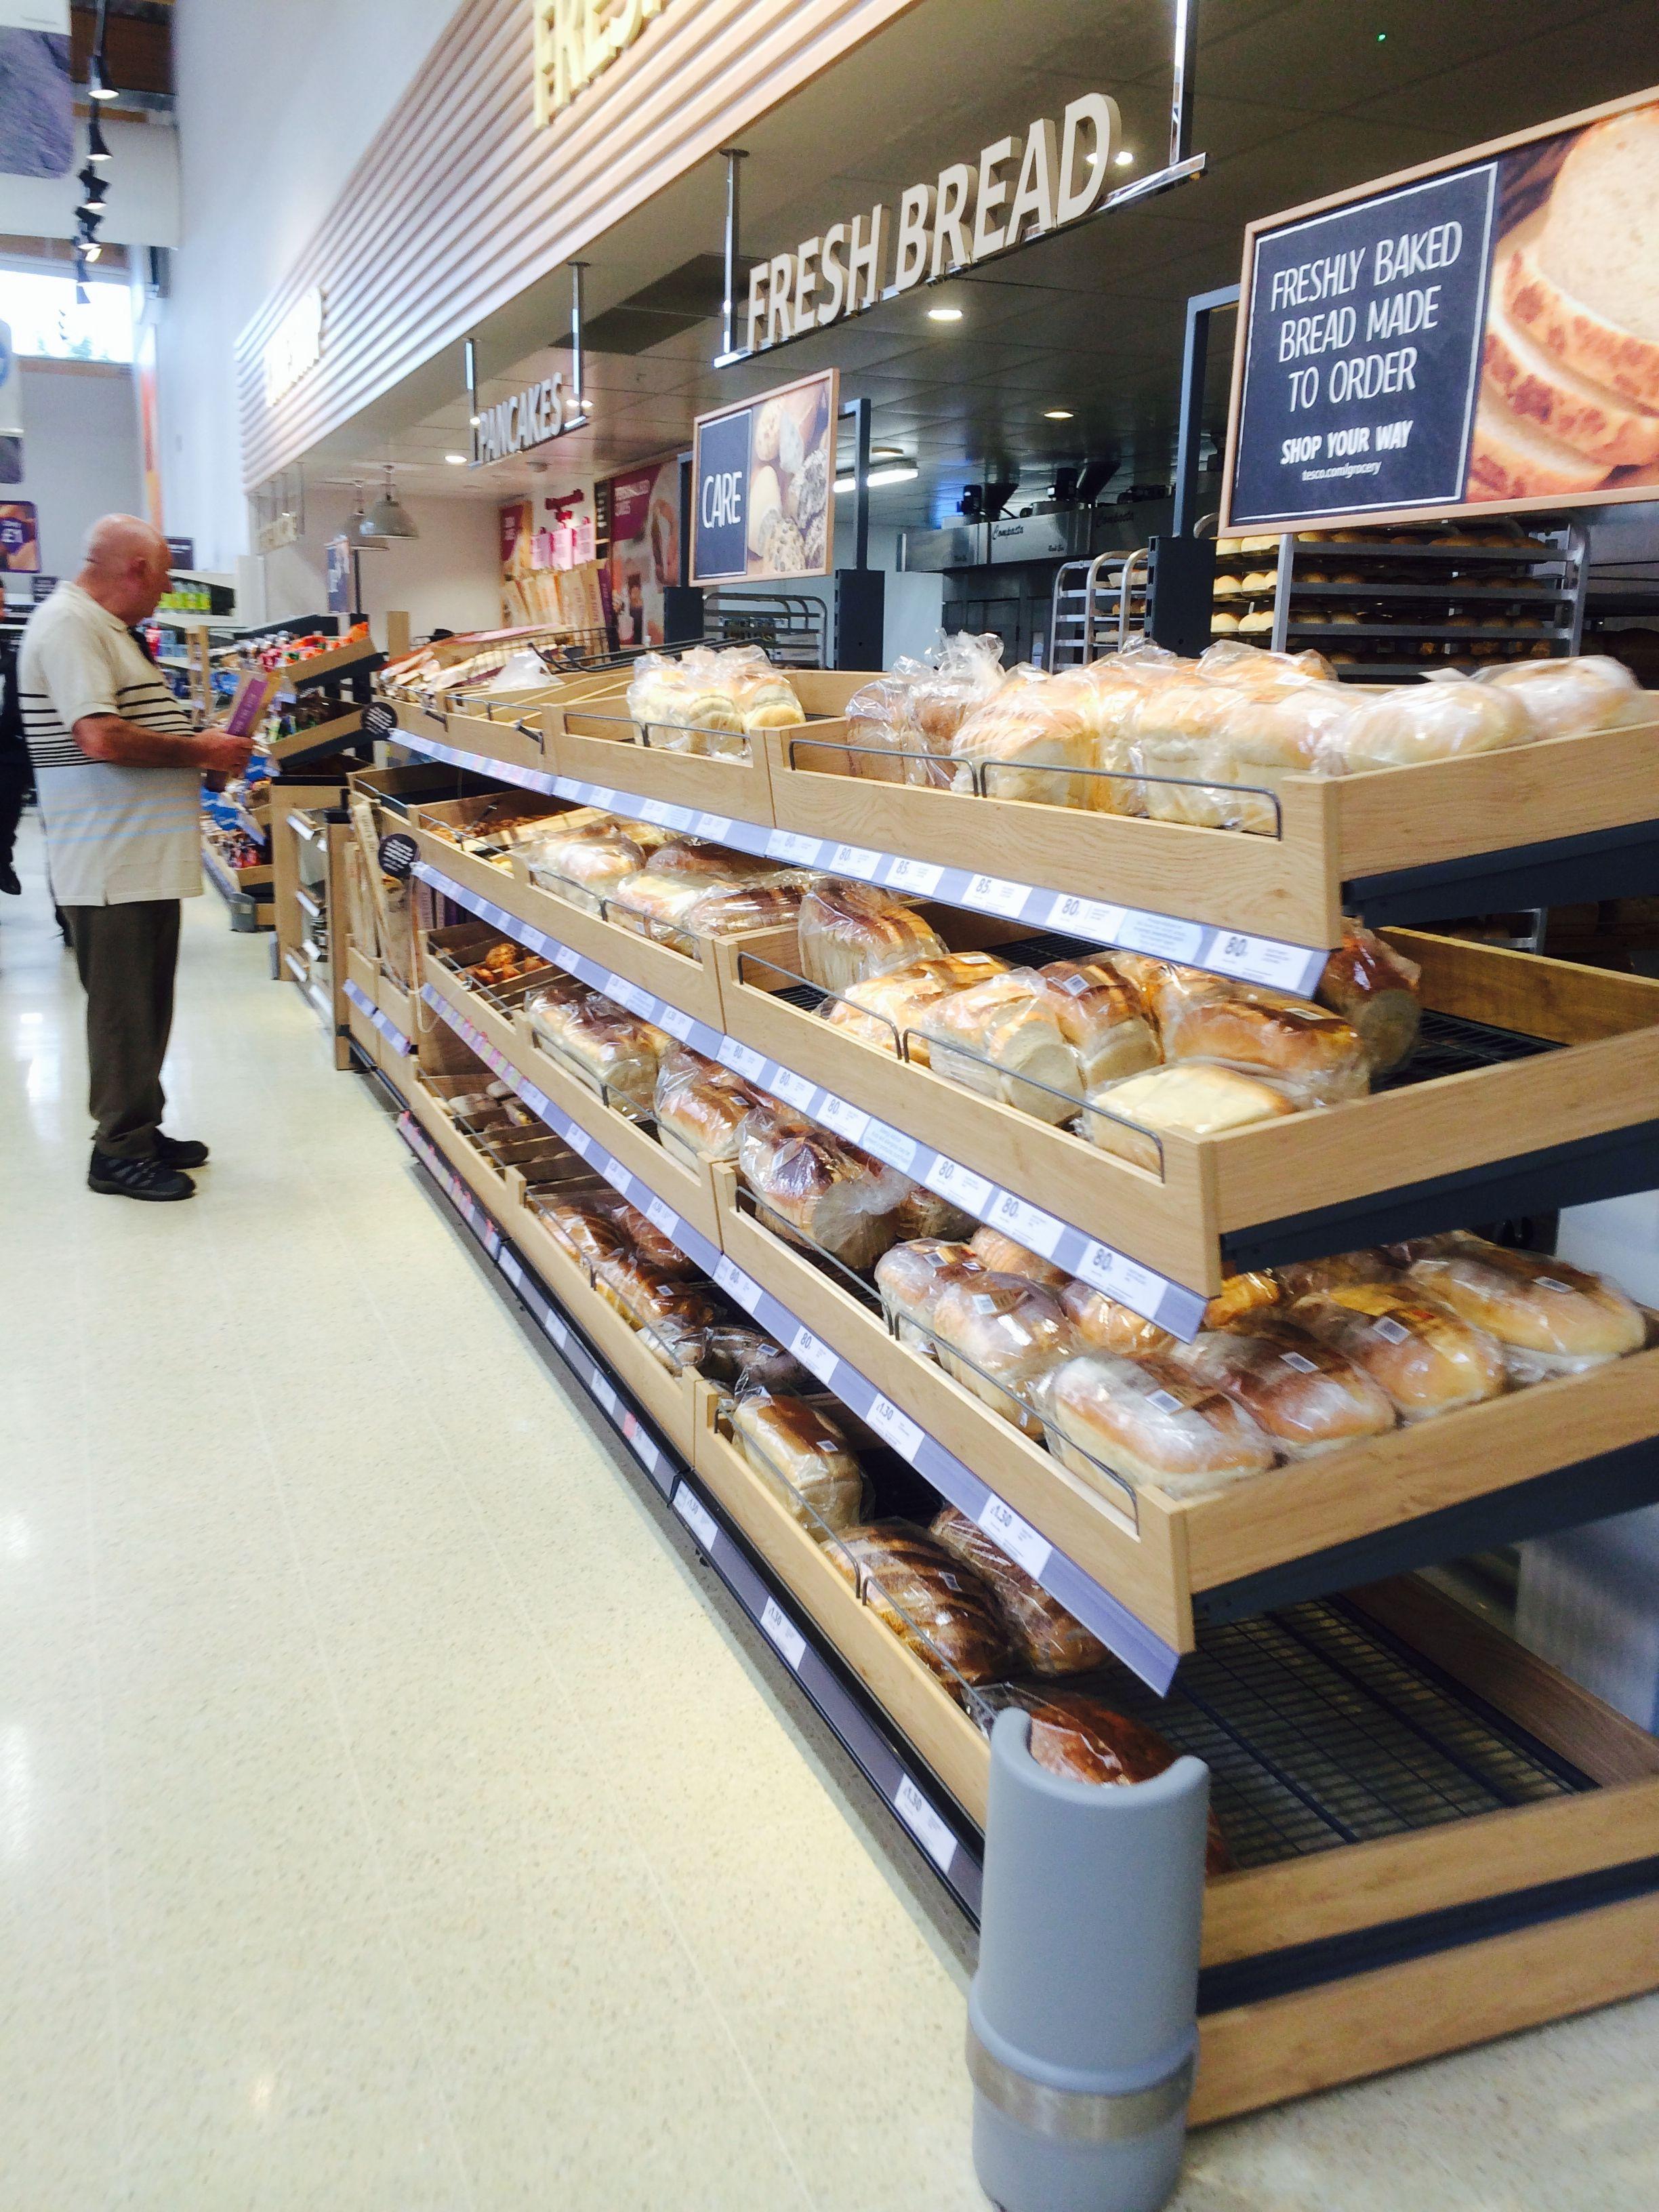 bb supermarket bakeries unclear - HD2448×3264